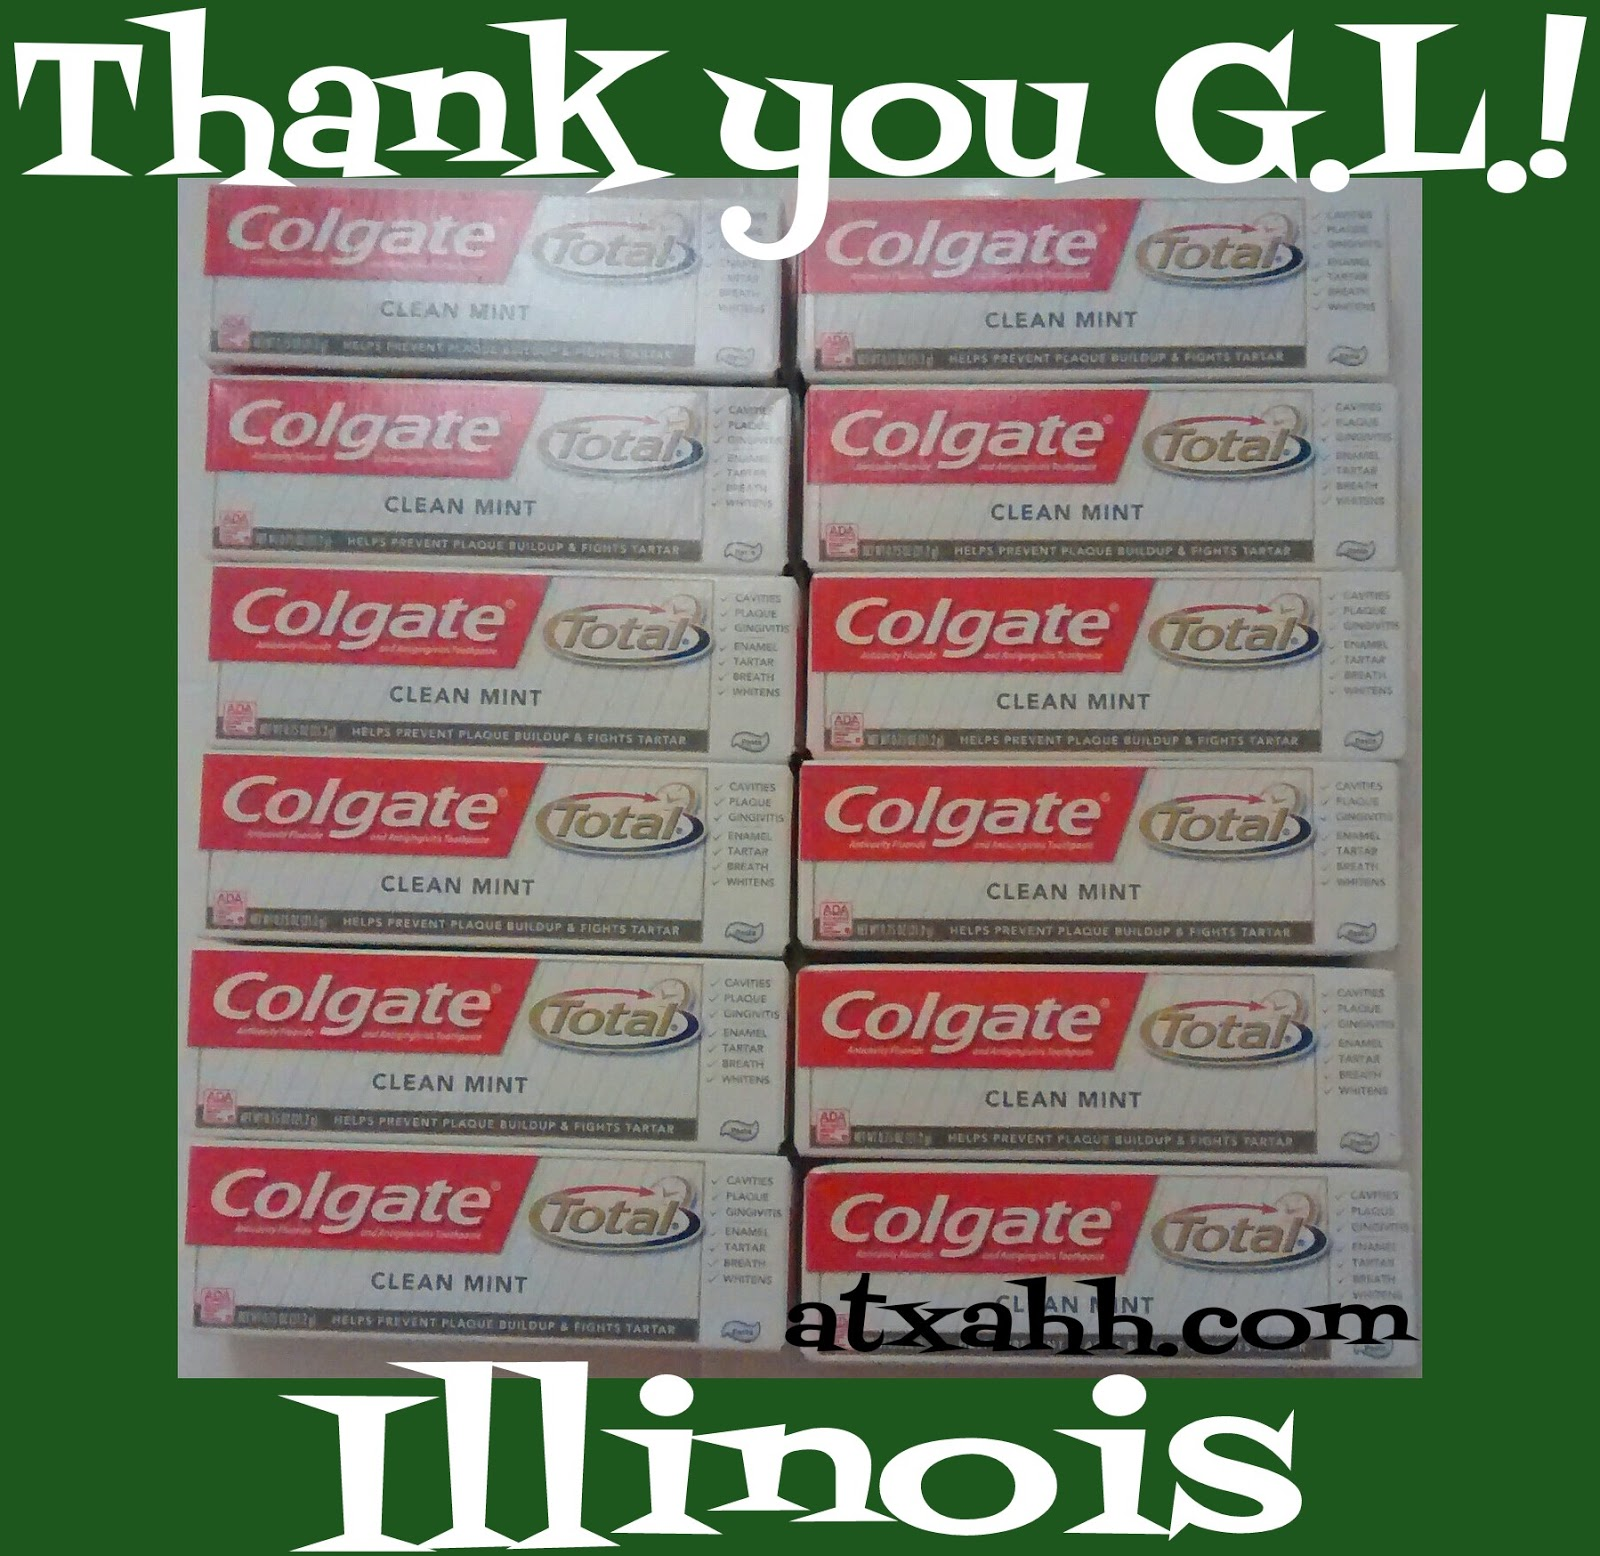 GL donation